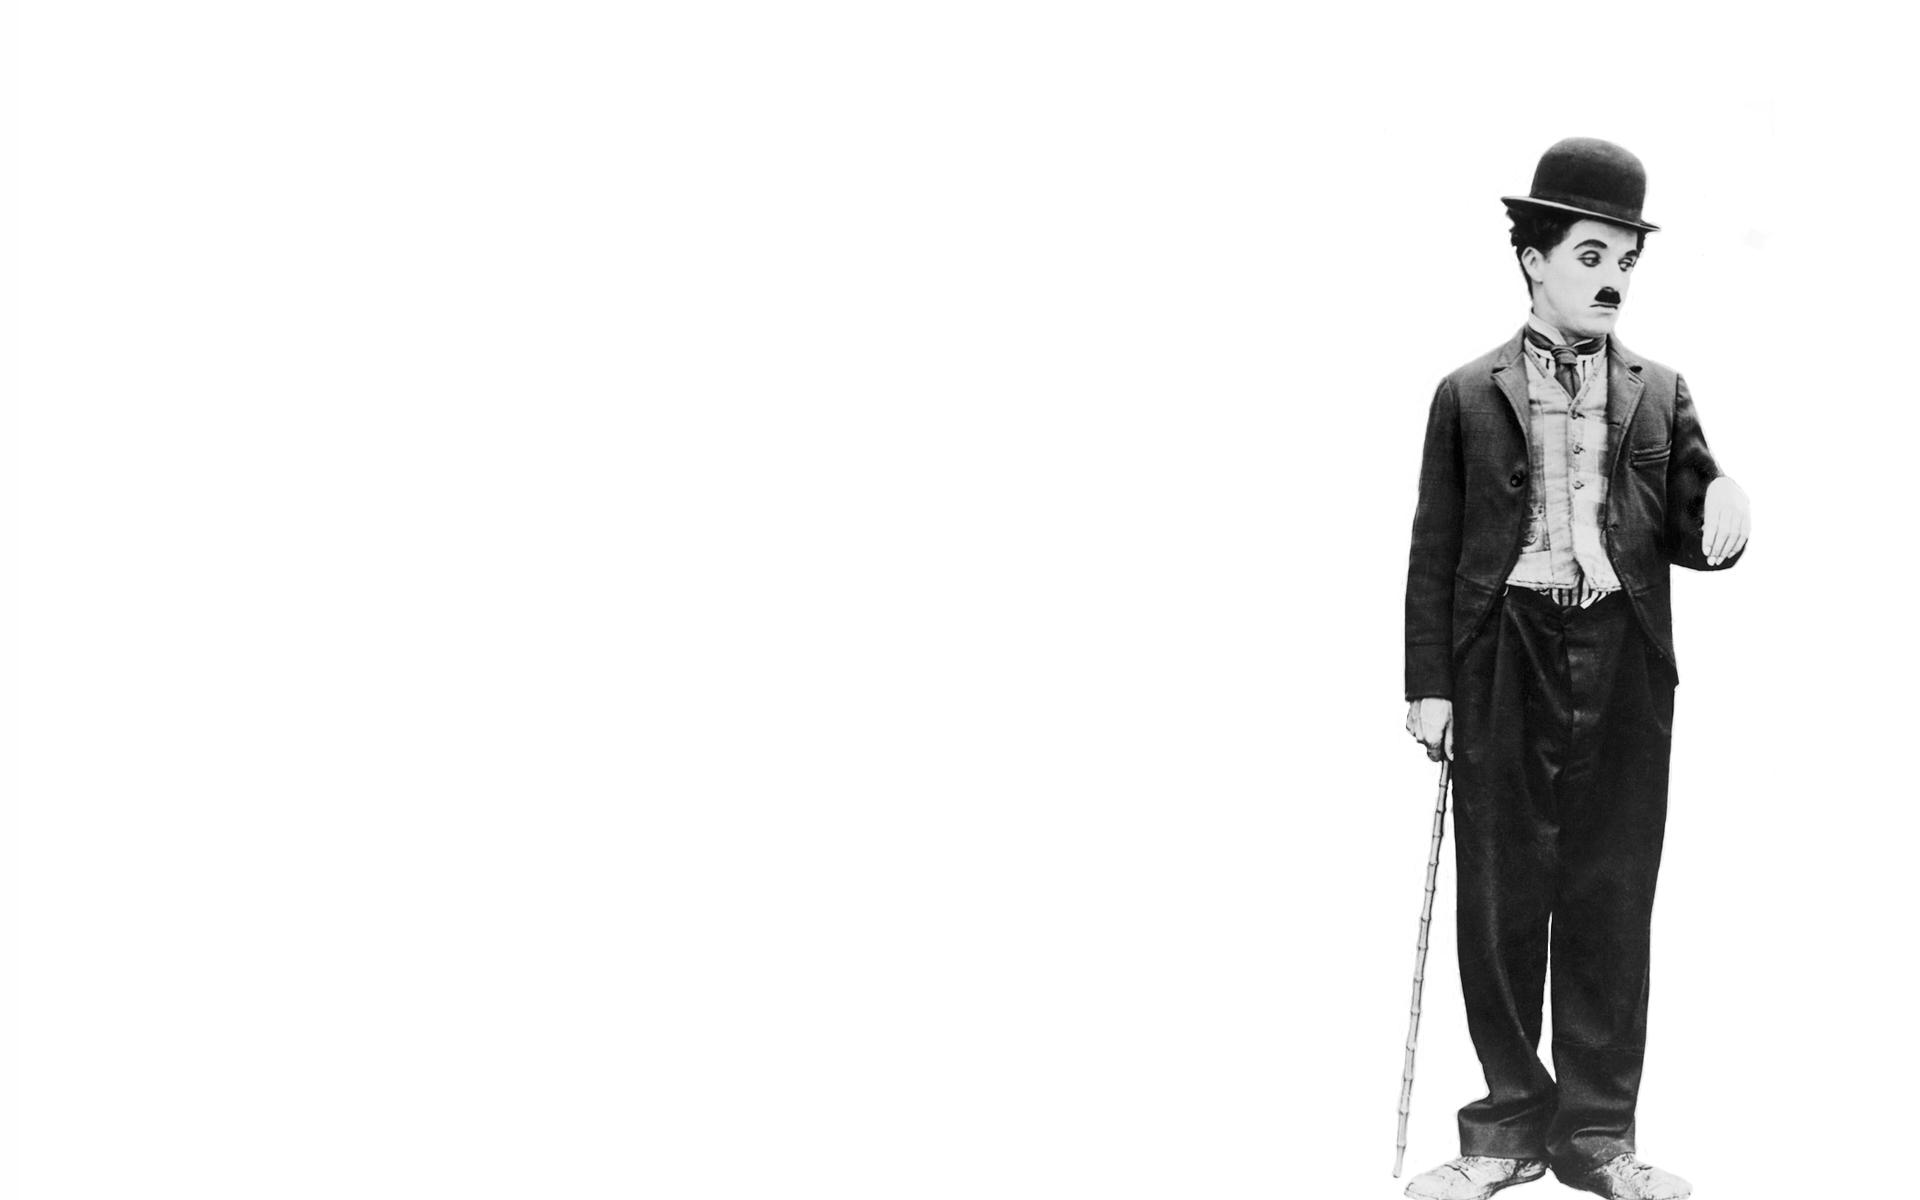 Charles Chaplin Wallpapers